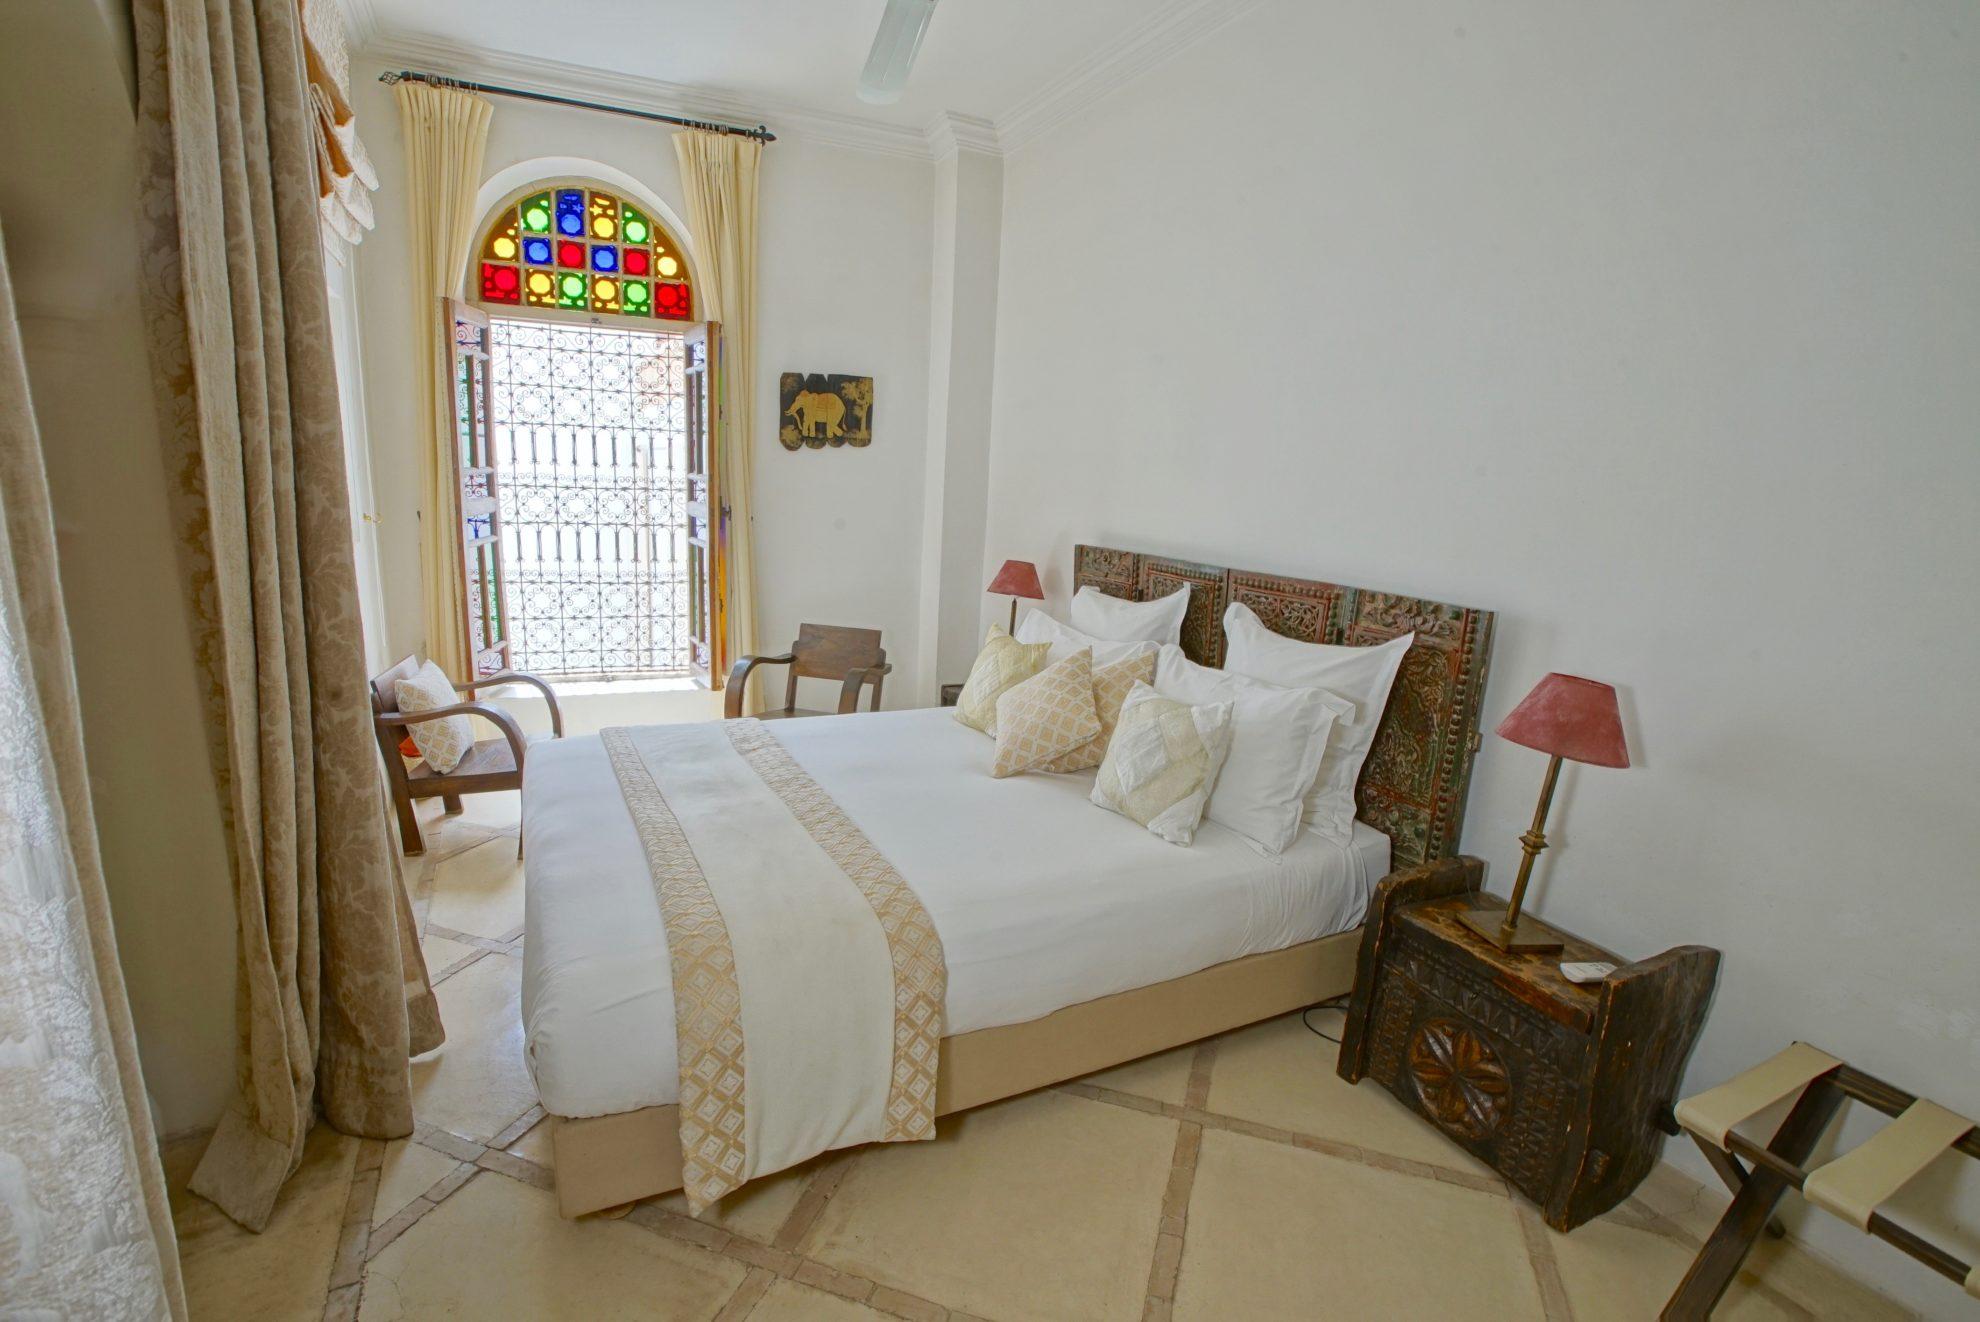 Chambre standard riad luxe dans la Médina de Marrakech